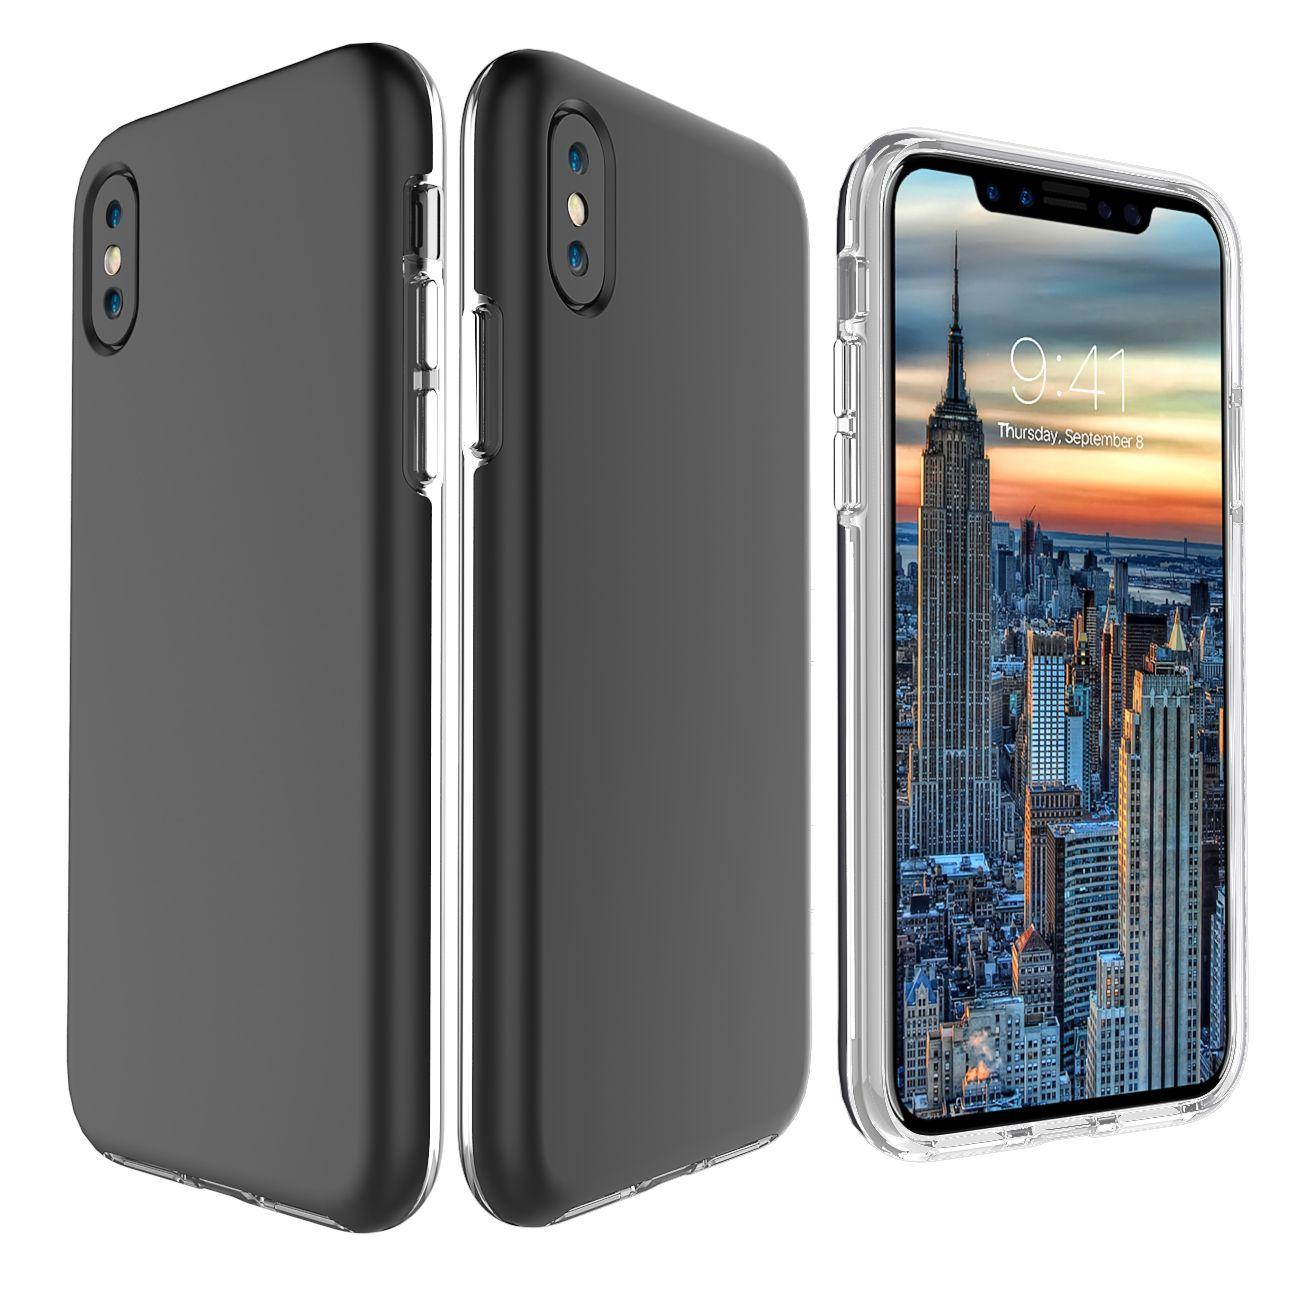 754195cf261 Personaliza Tu Movil Para IPhone XS MAX Slim Hybrid Armor Funda Para  Teléfono Para IPhone XR X 8 7 Plus Samsung S9 Plus A8 2018 J2 Primer LG G6  V30 HUAWEI ...